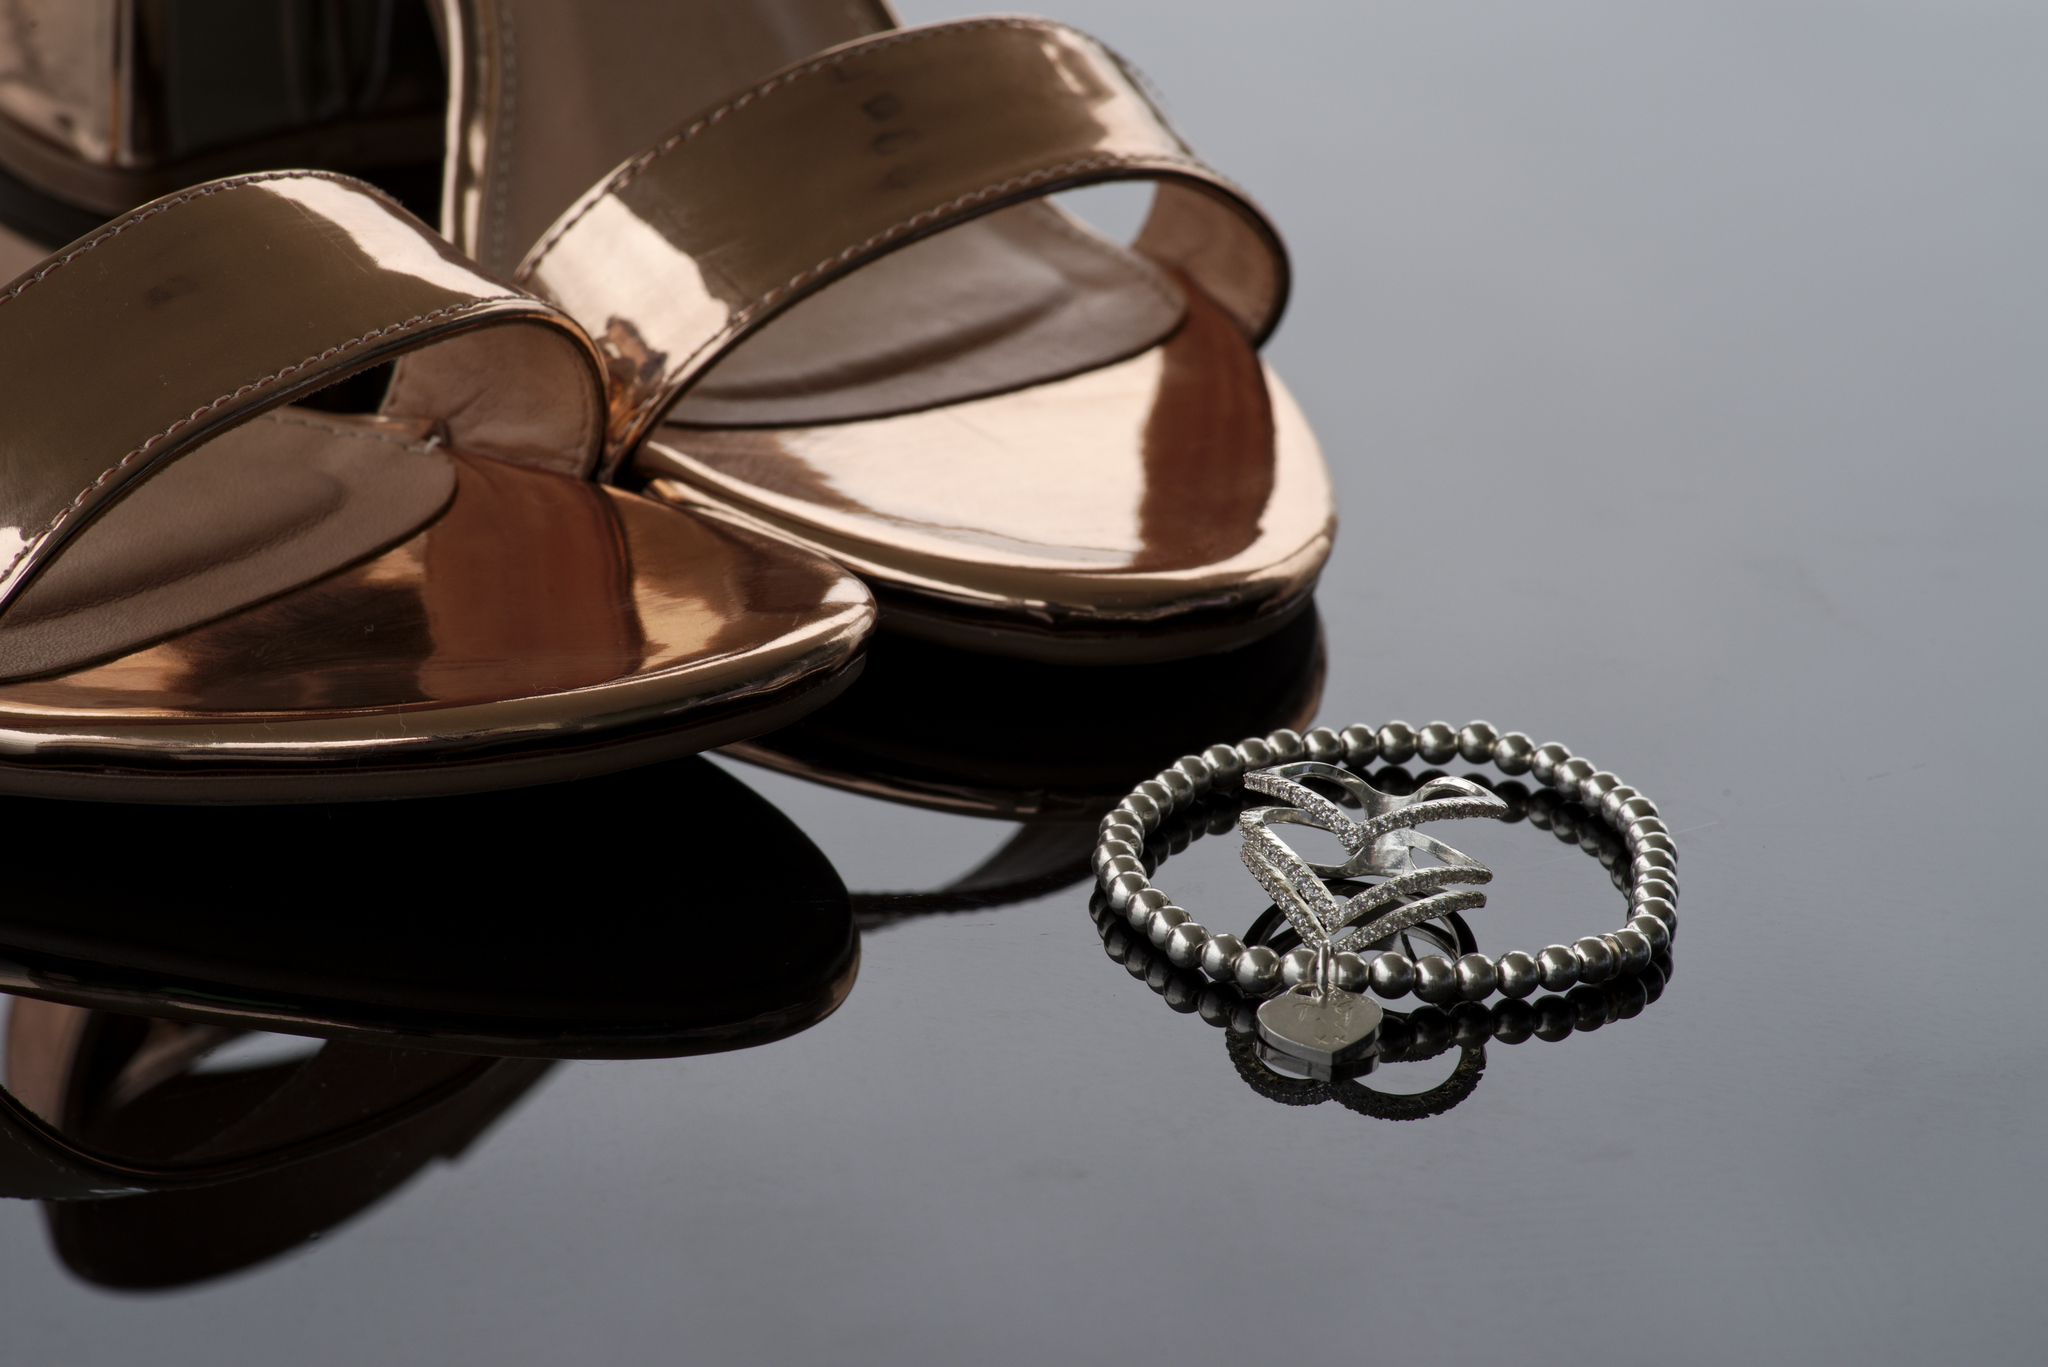 bride_shoes_2.jpg